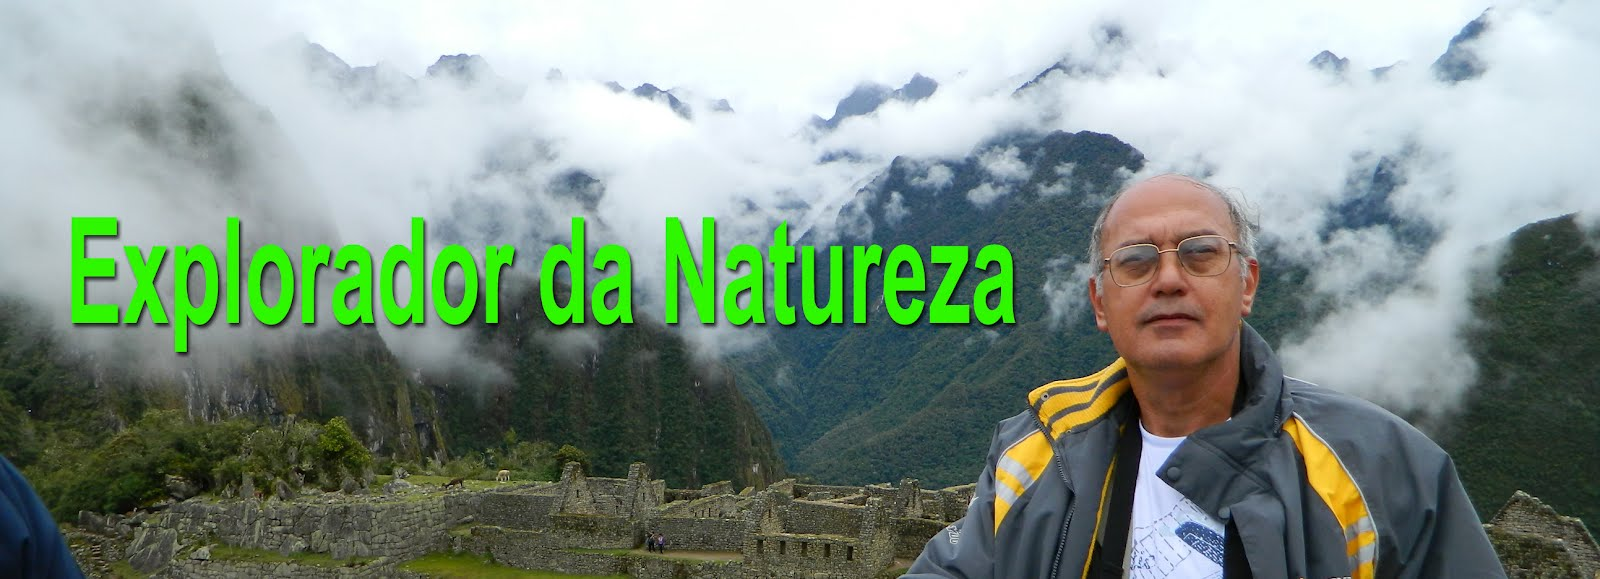 Explorador da Natureza